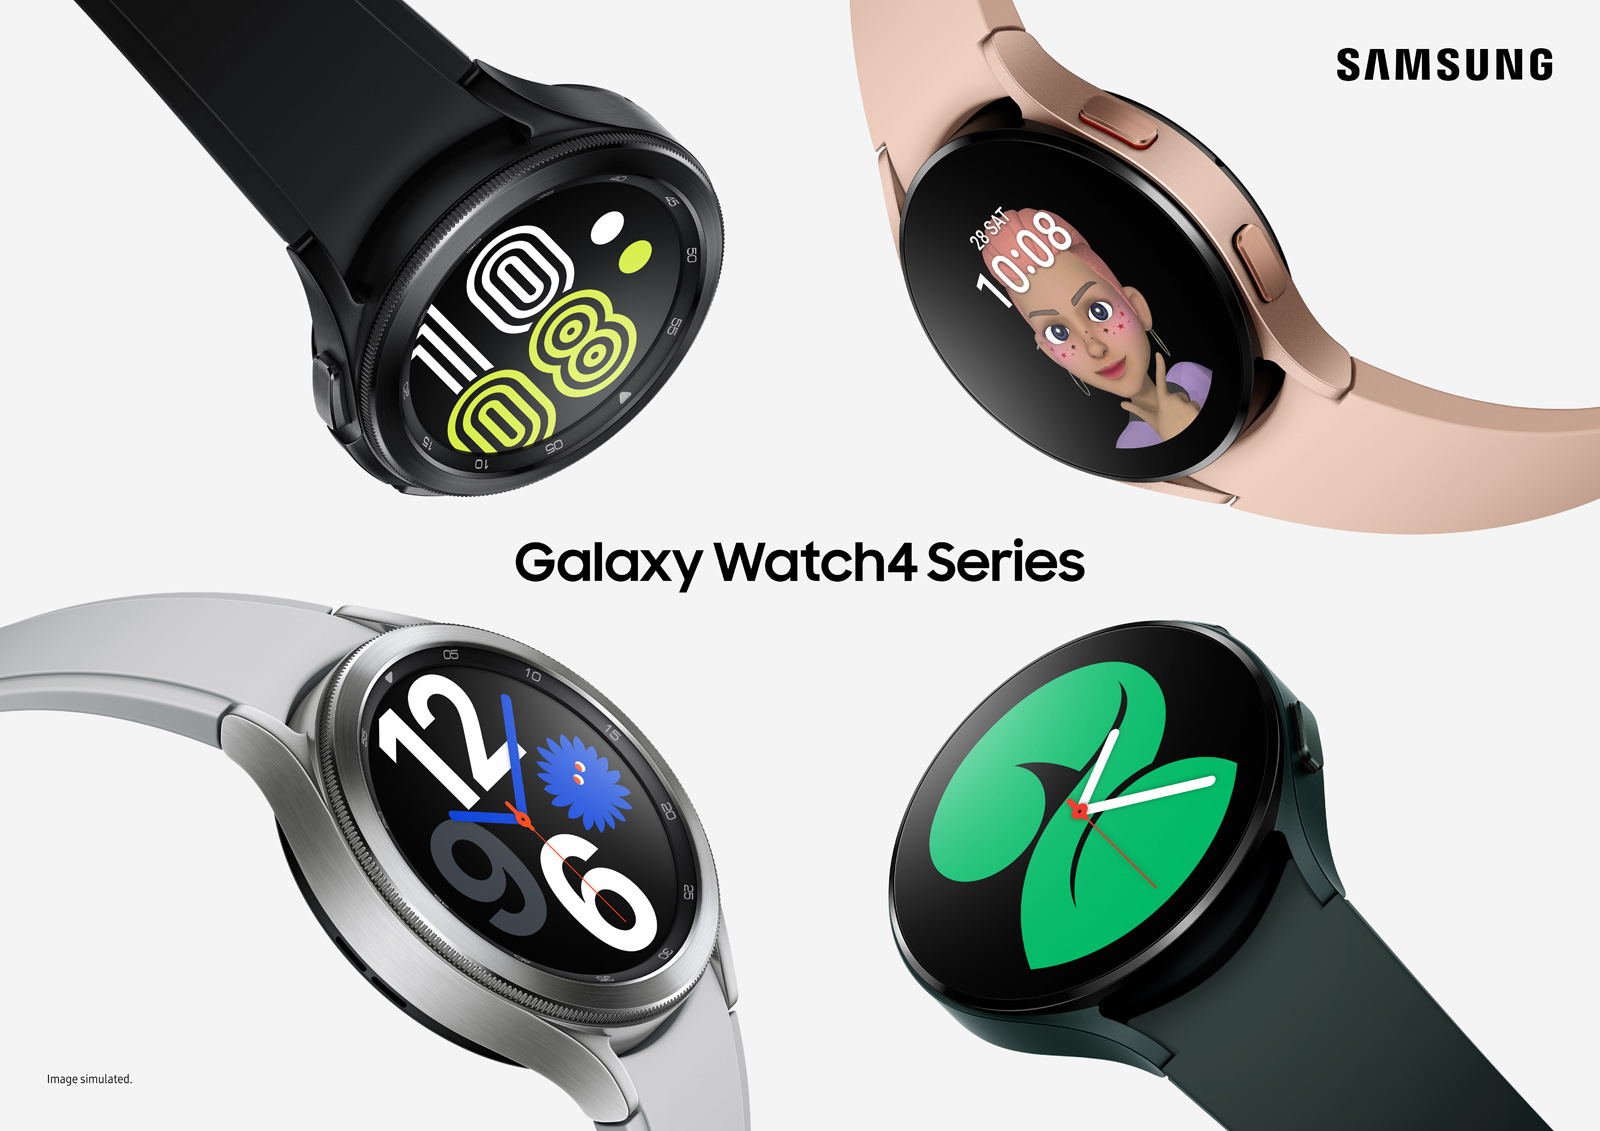 004 galaxywatch4 galaxywatch4classic series main 2p